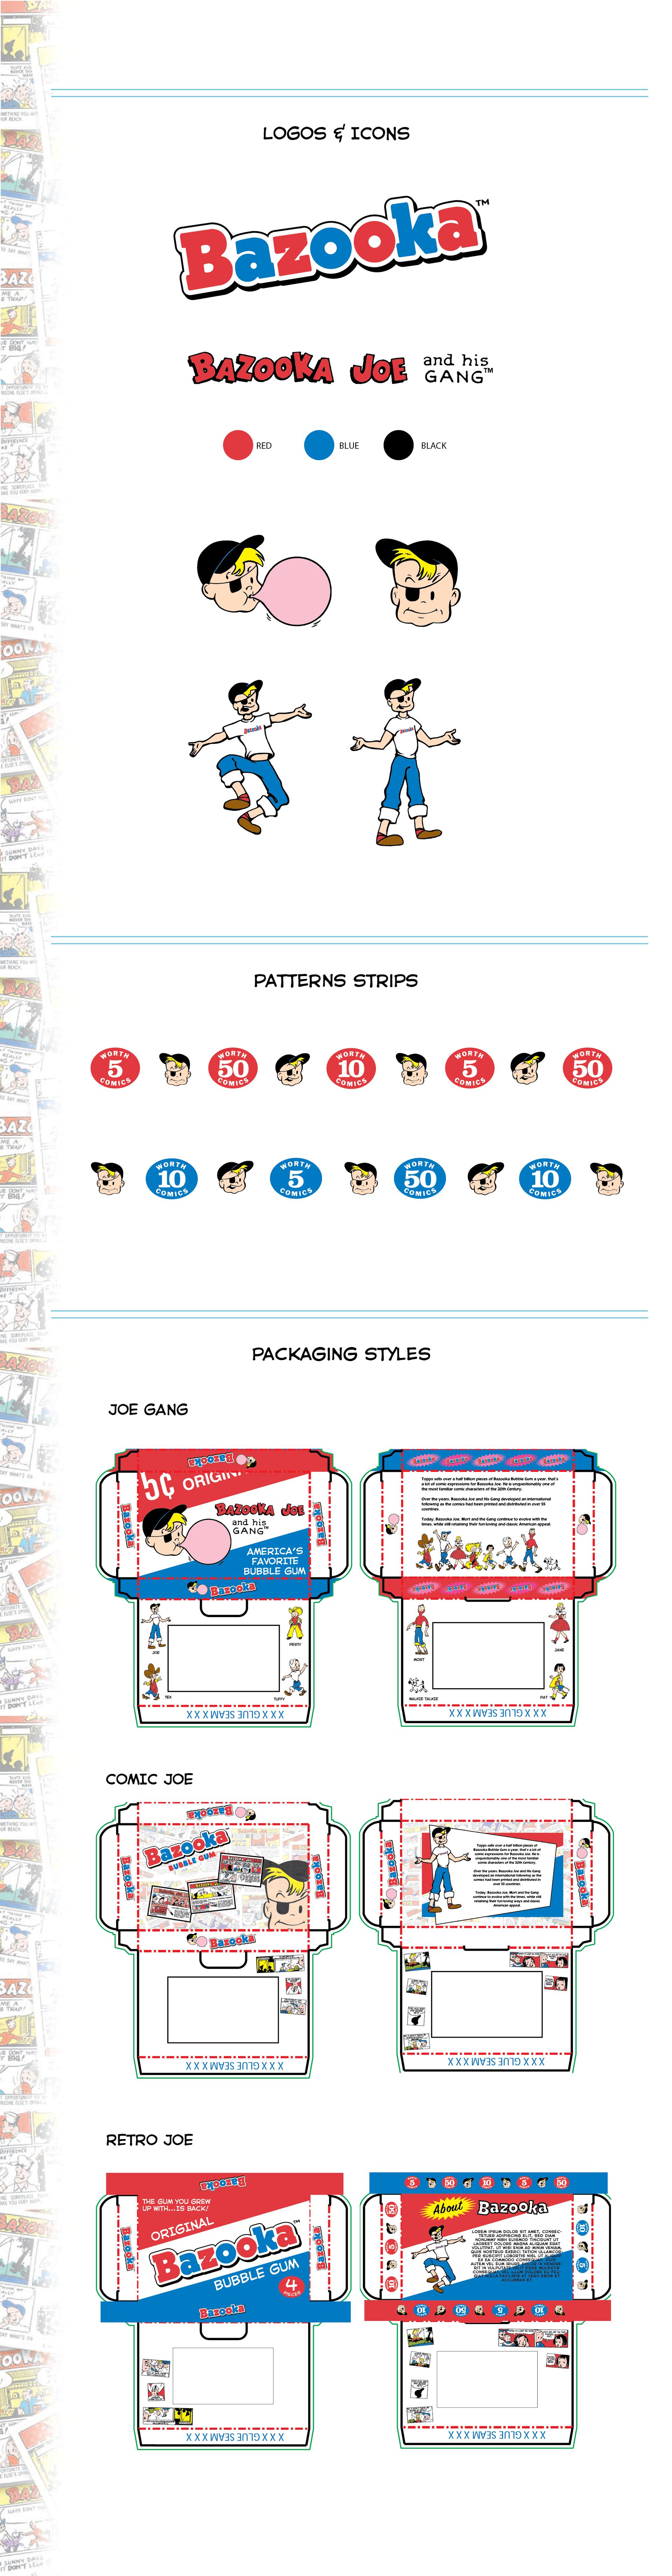 bazooka-packaging layout-01.png